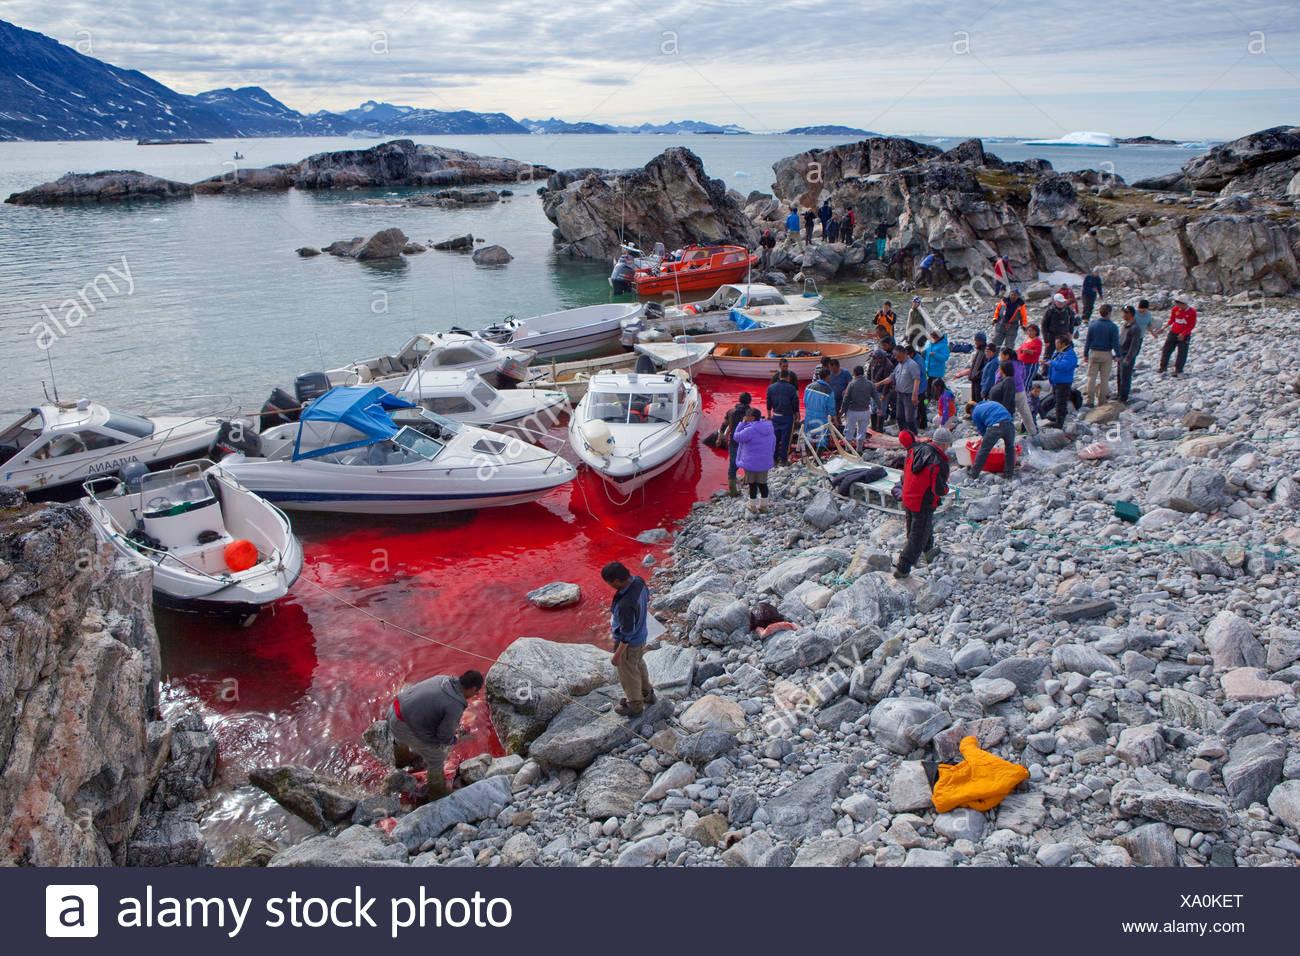 Inuit, whaling, Sermiligaaq, Greenland, East Greenland, ship, boat, ships, boats, blood, Sermiligaaq, - Stock Image